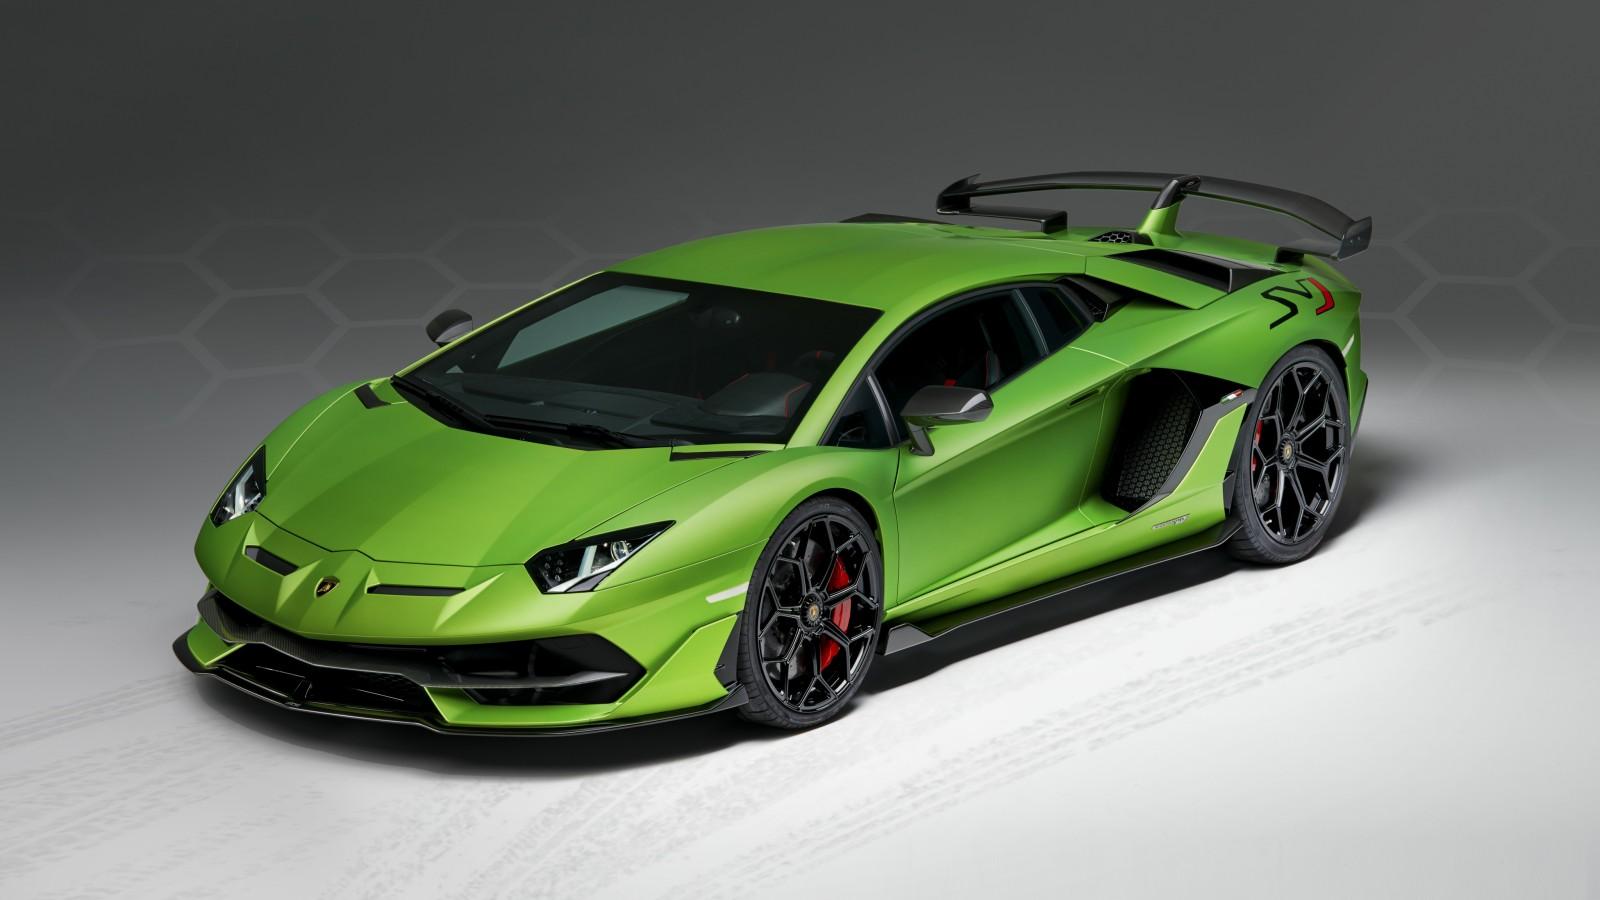 2019 Lamborghini Aventador Svj 4k 2 Wallpaper Hd Car